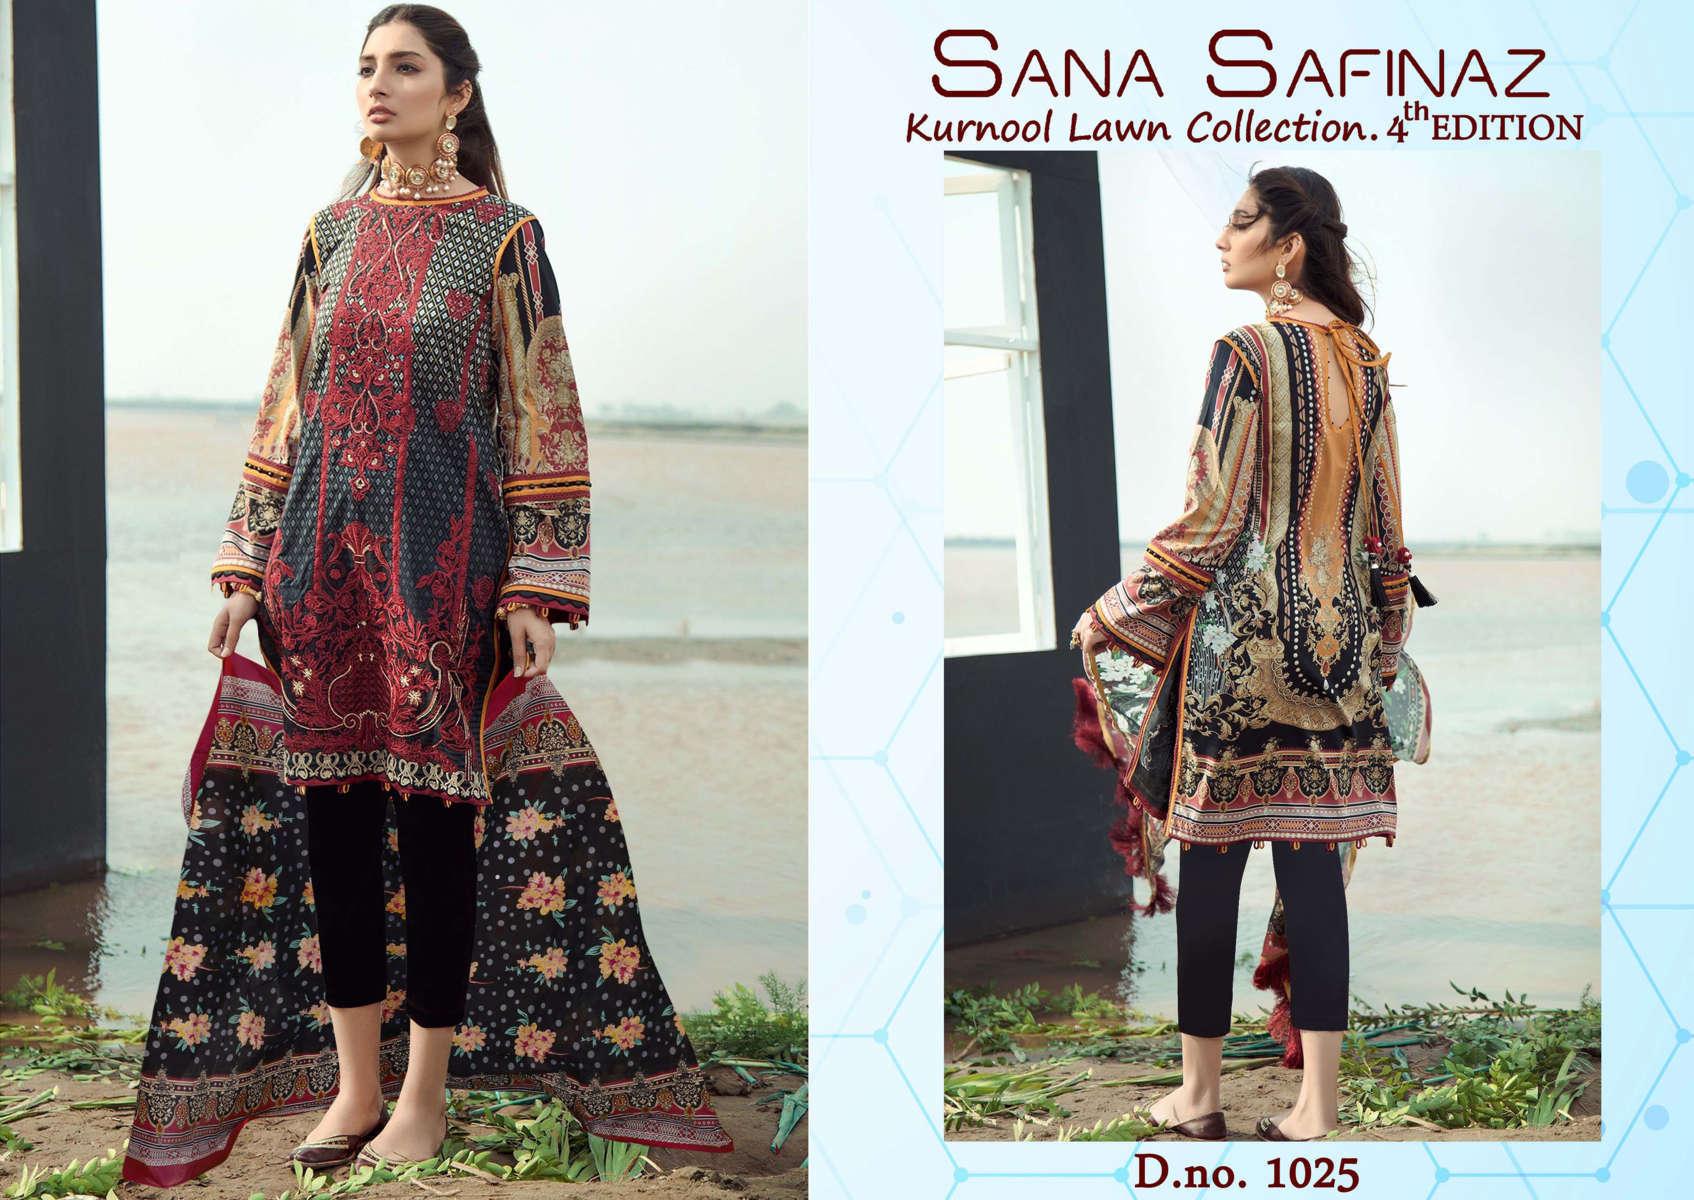 Sana Safinaz Kurnool Lawn Collection Vol 4 th Edition Salwar Suit Wholesale Catalog 4 Pcs 3 - Sana Safinaz Kurnool Lawn Collection Vol 4 th Edition Salwar Suit Wholesale Catalog 4 Pcs